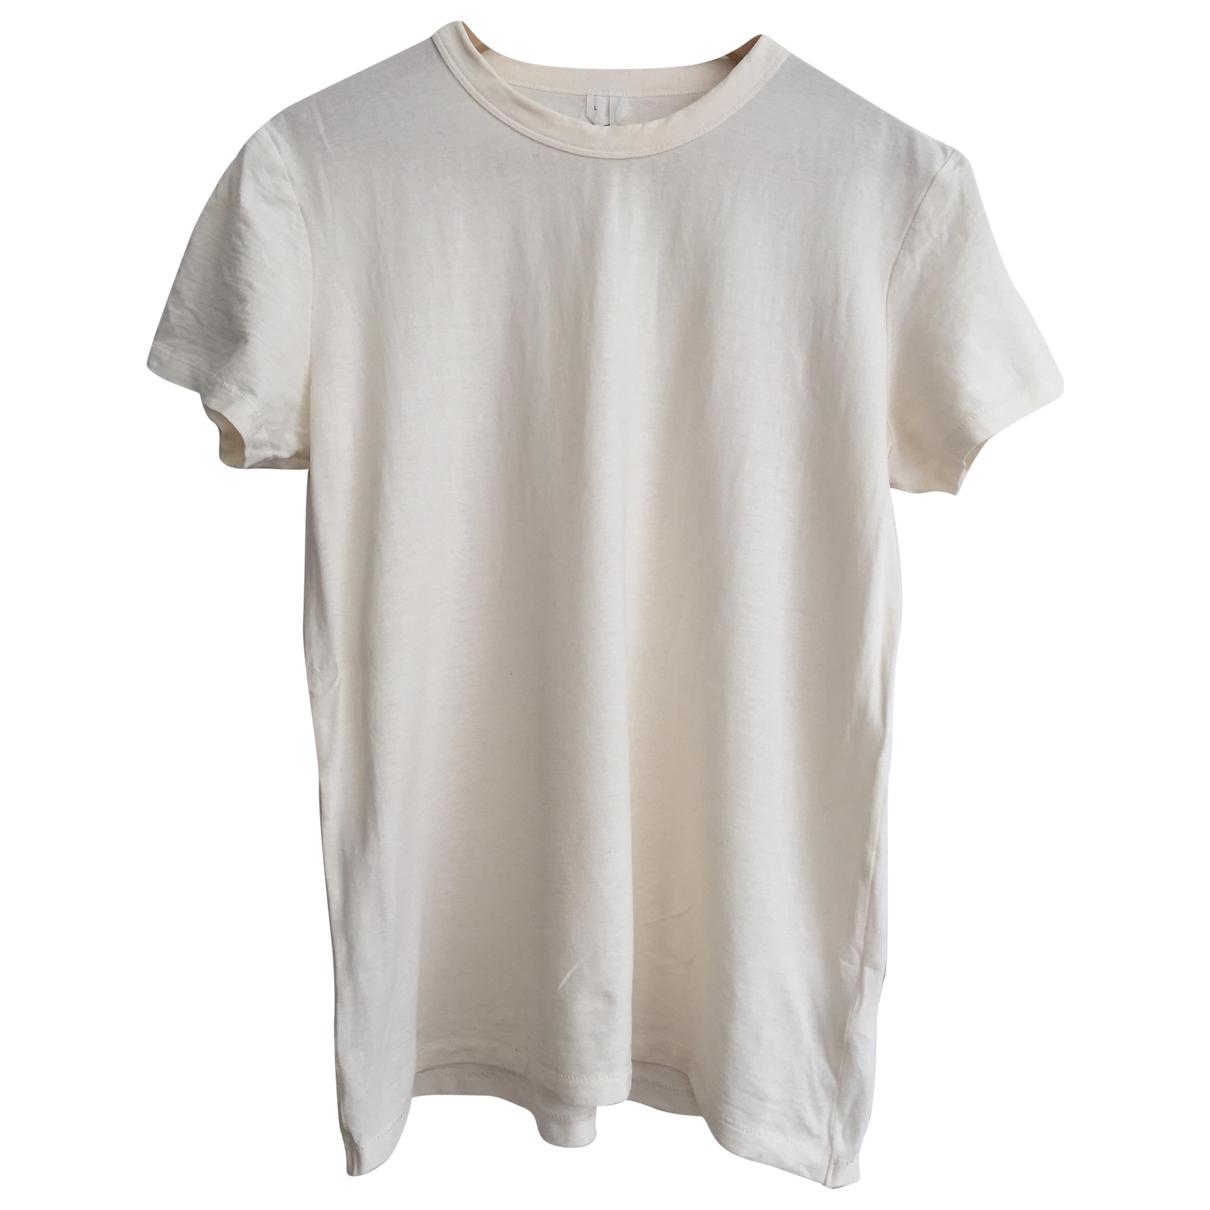 Arket \N White Cotton  top for Women L International